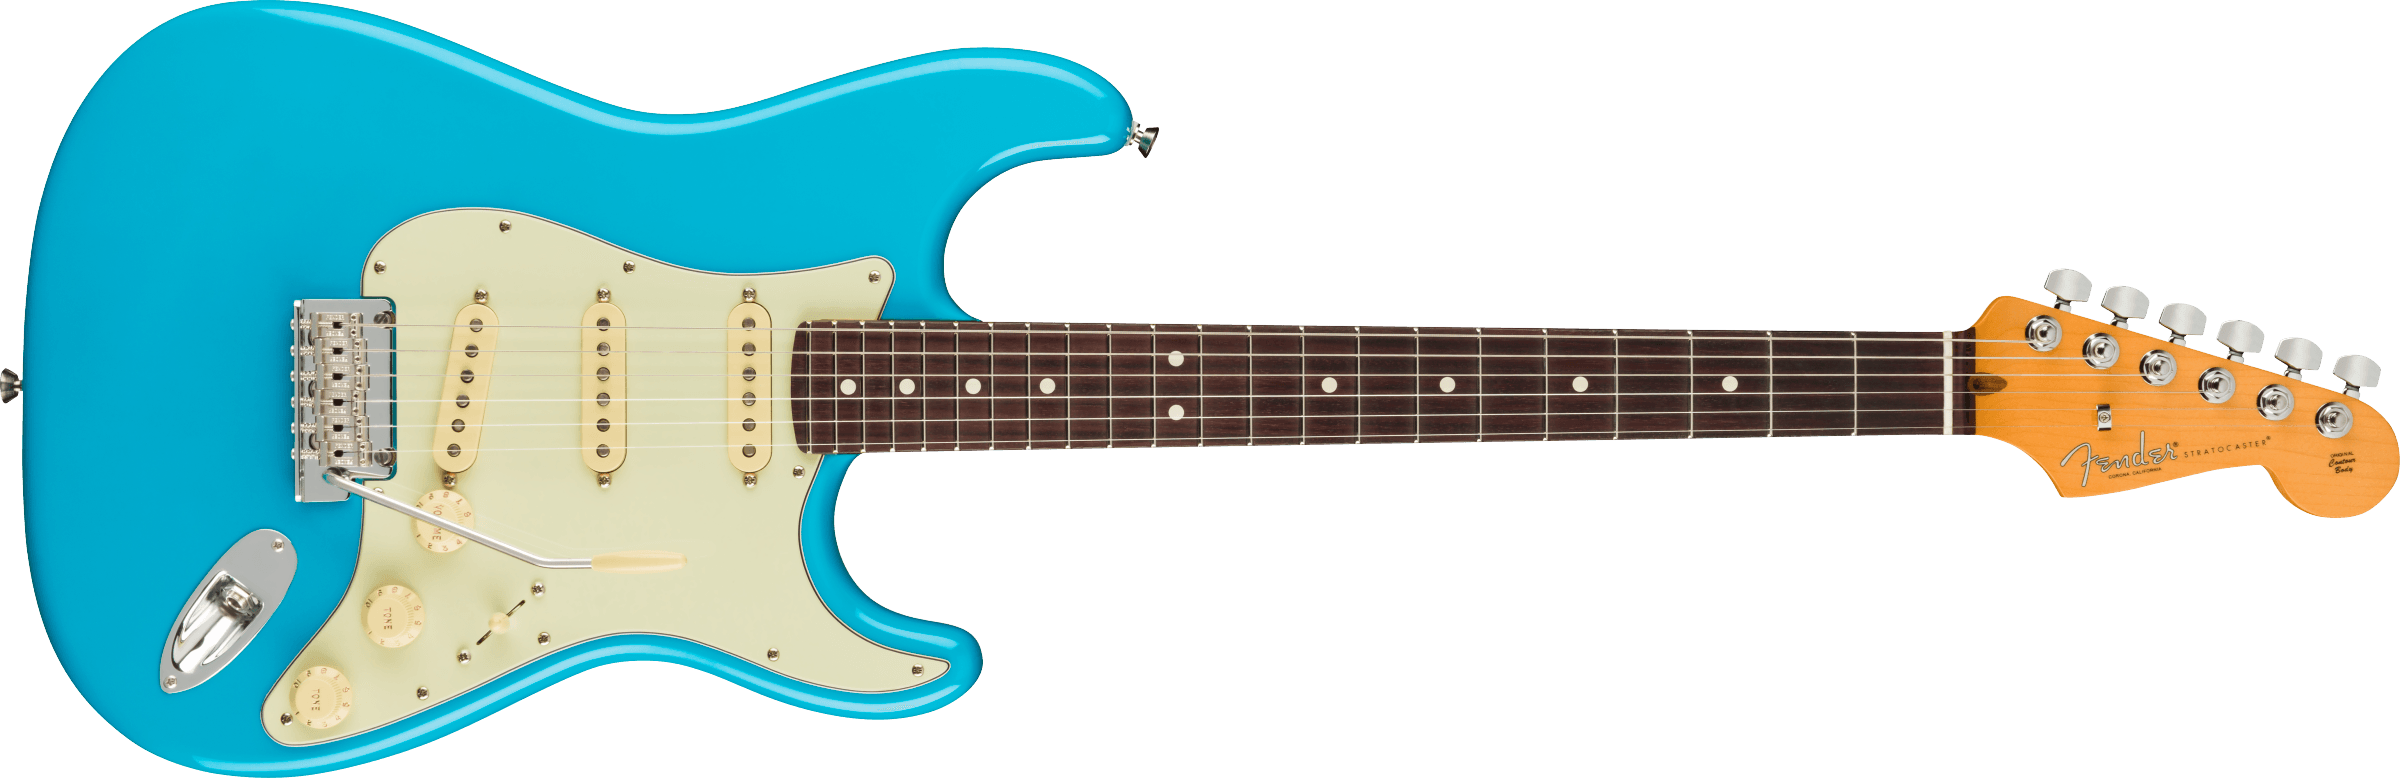 FENDER-American-Professional-II-Stratocaster-Rosewood-Fingerboard-Miami-Blue-sku-571005518